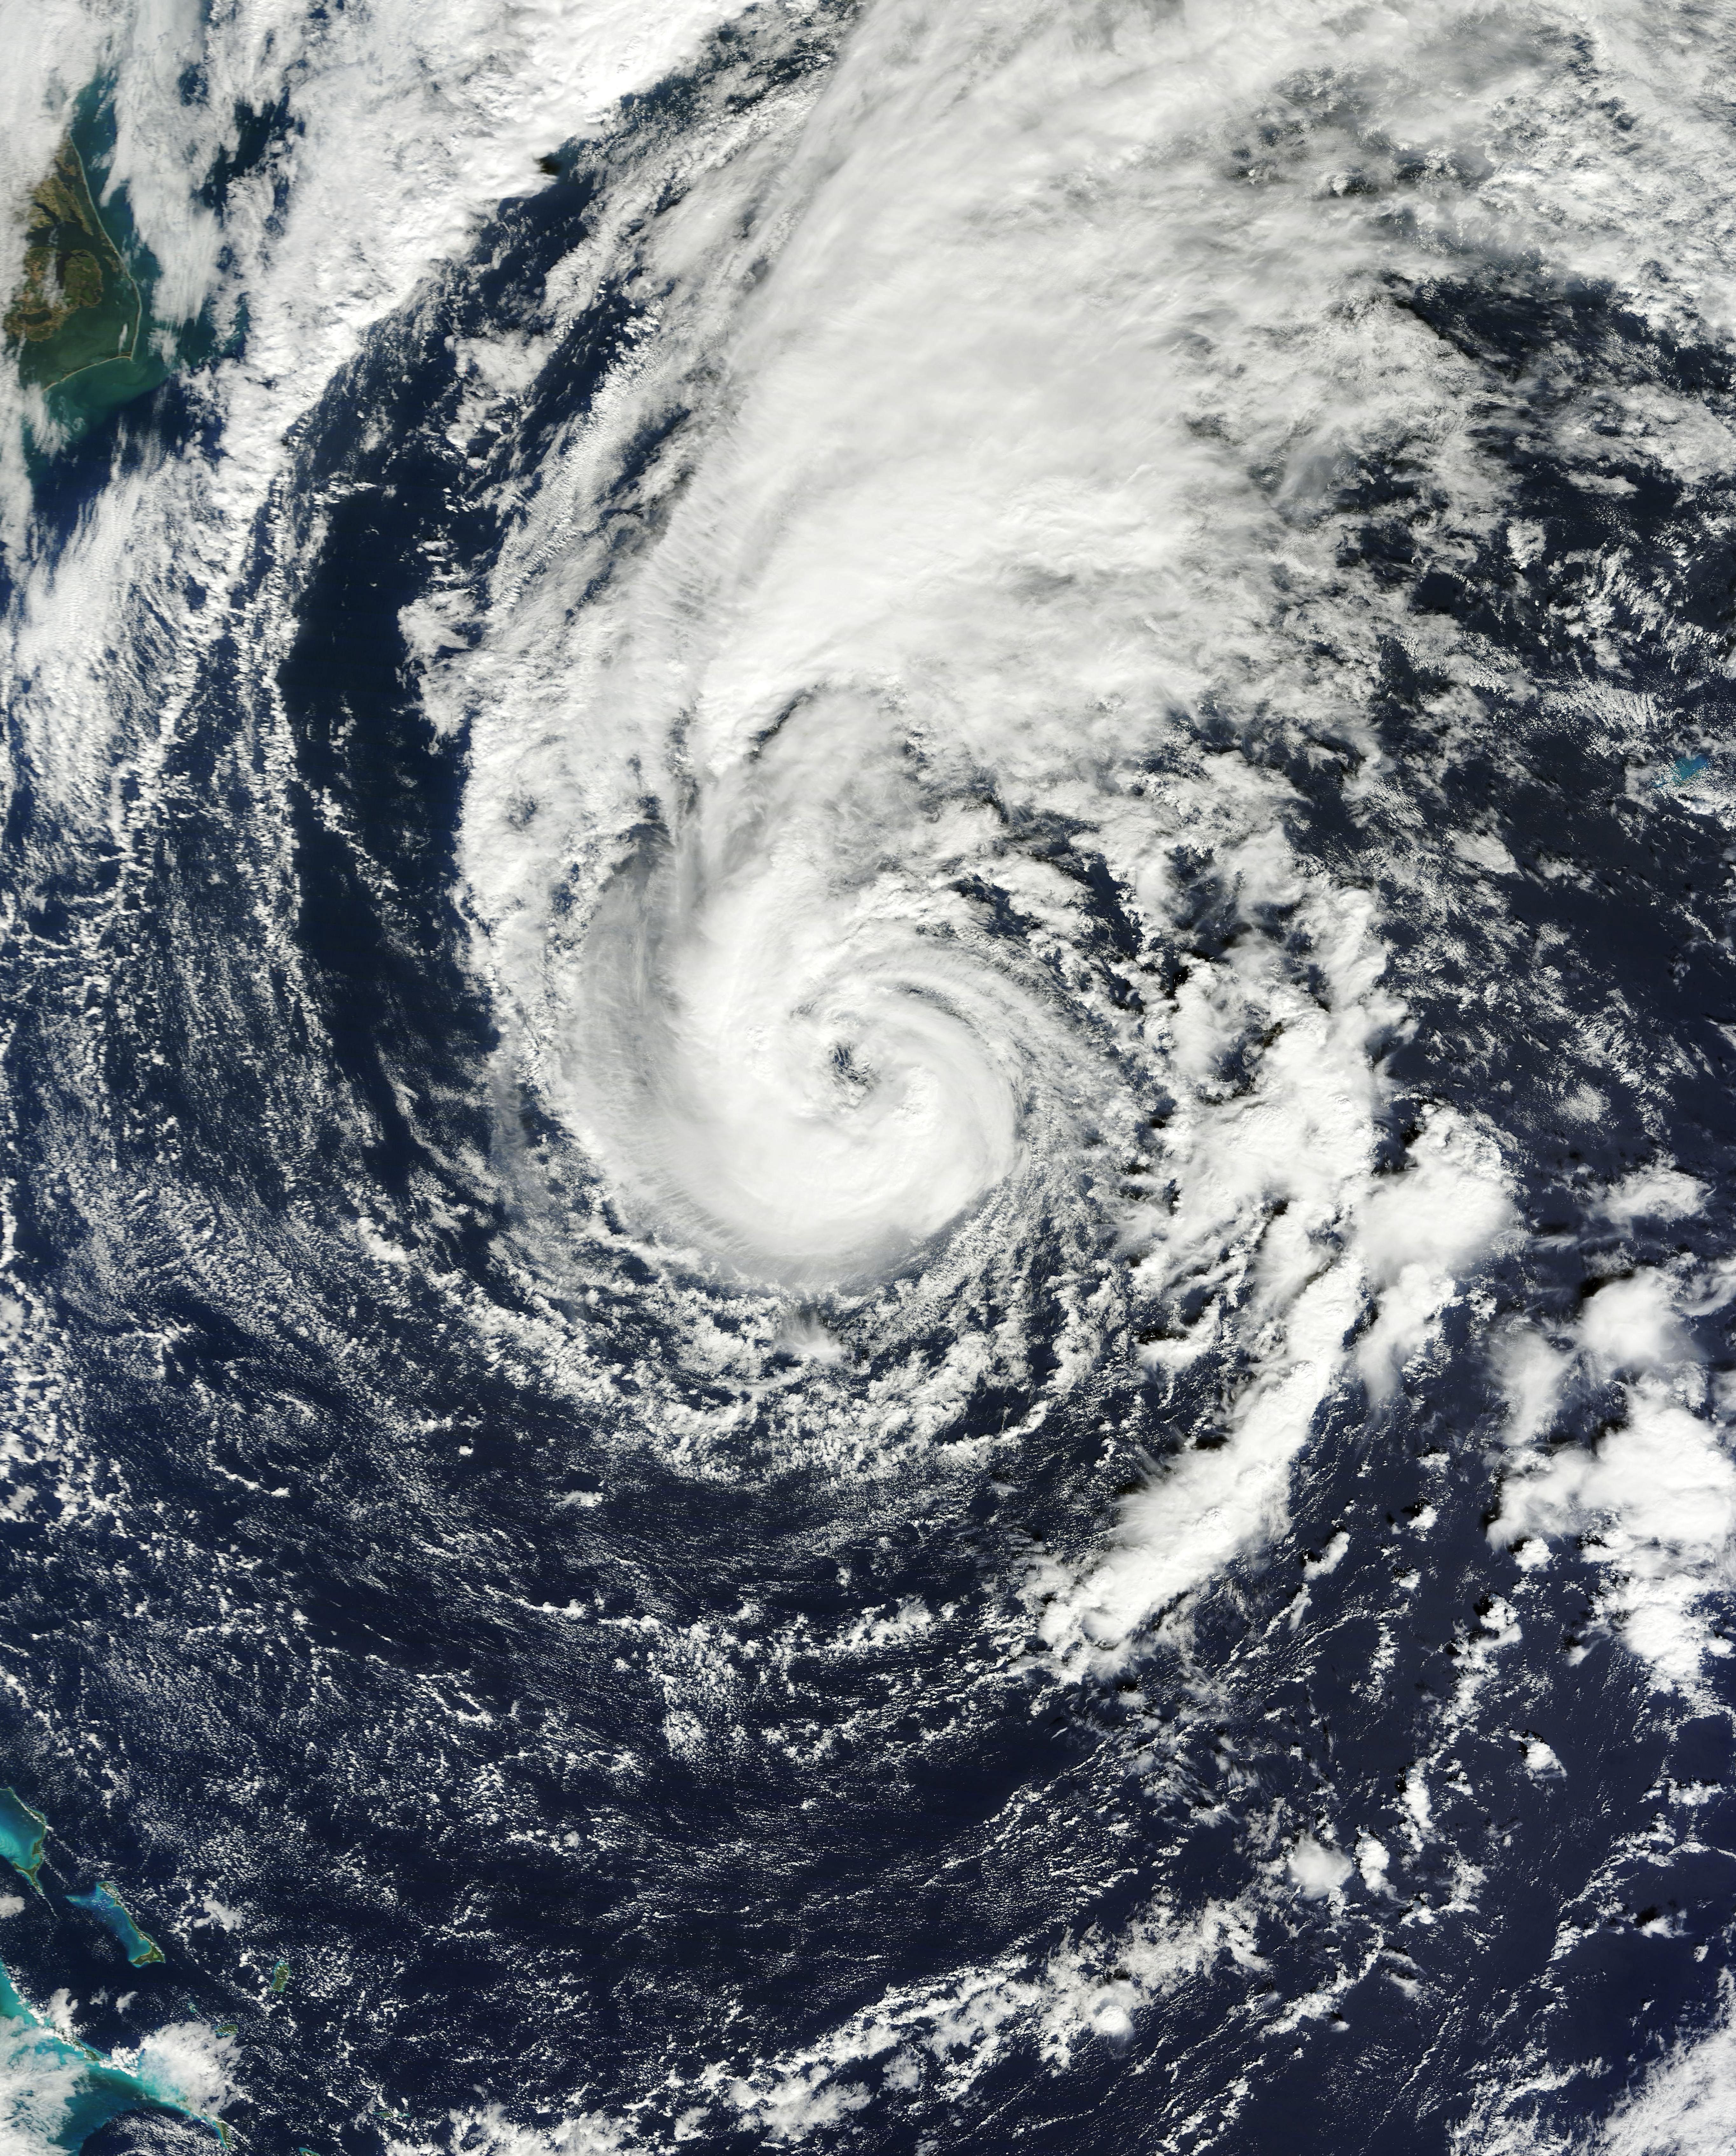 File:Tropical Storm Sean Nov 10 2011 1515Z.jpg